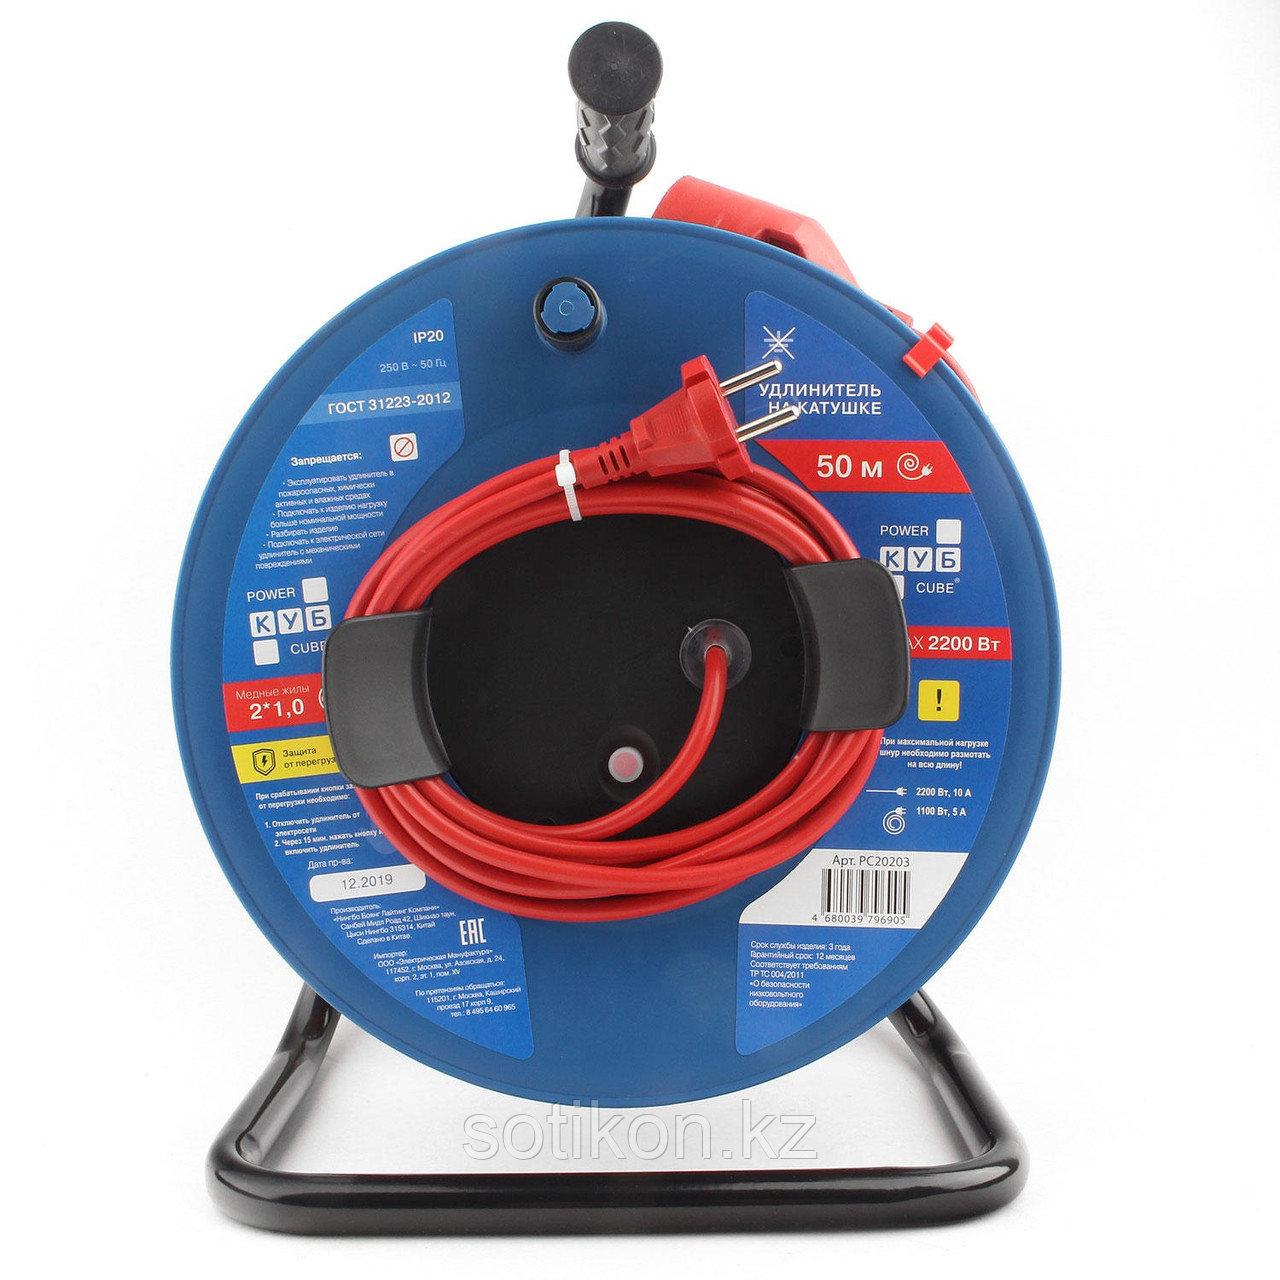 Силовой удлинитель на катушке Power Cube PC-B1-K-50, 10 А/2,2 кВт, 50 м, 1 розетка б/з, красно-синий